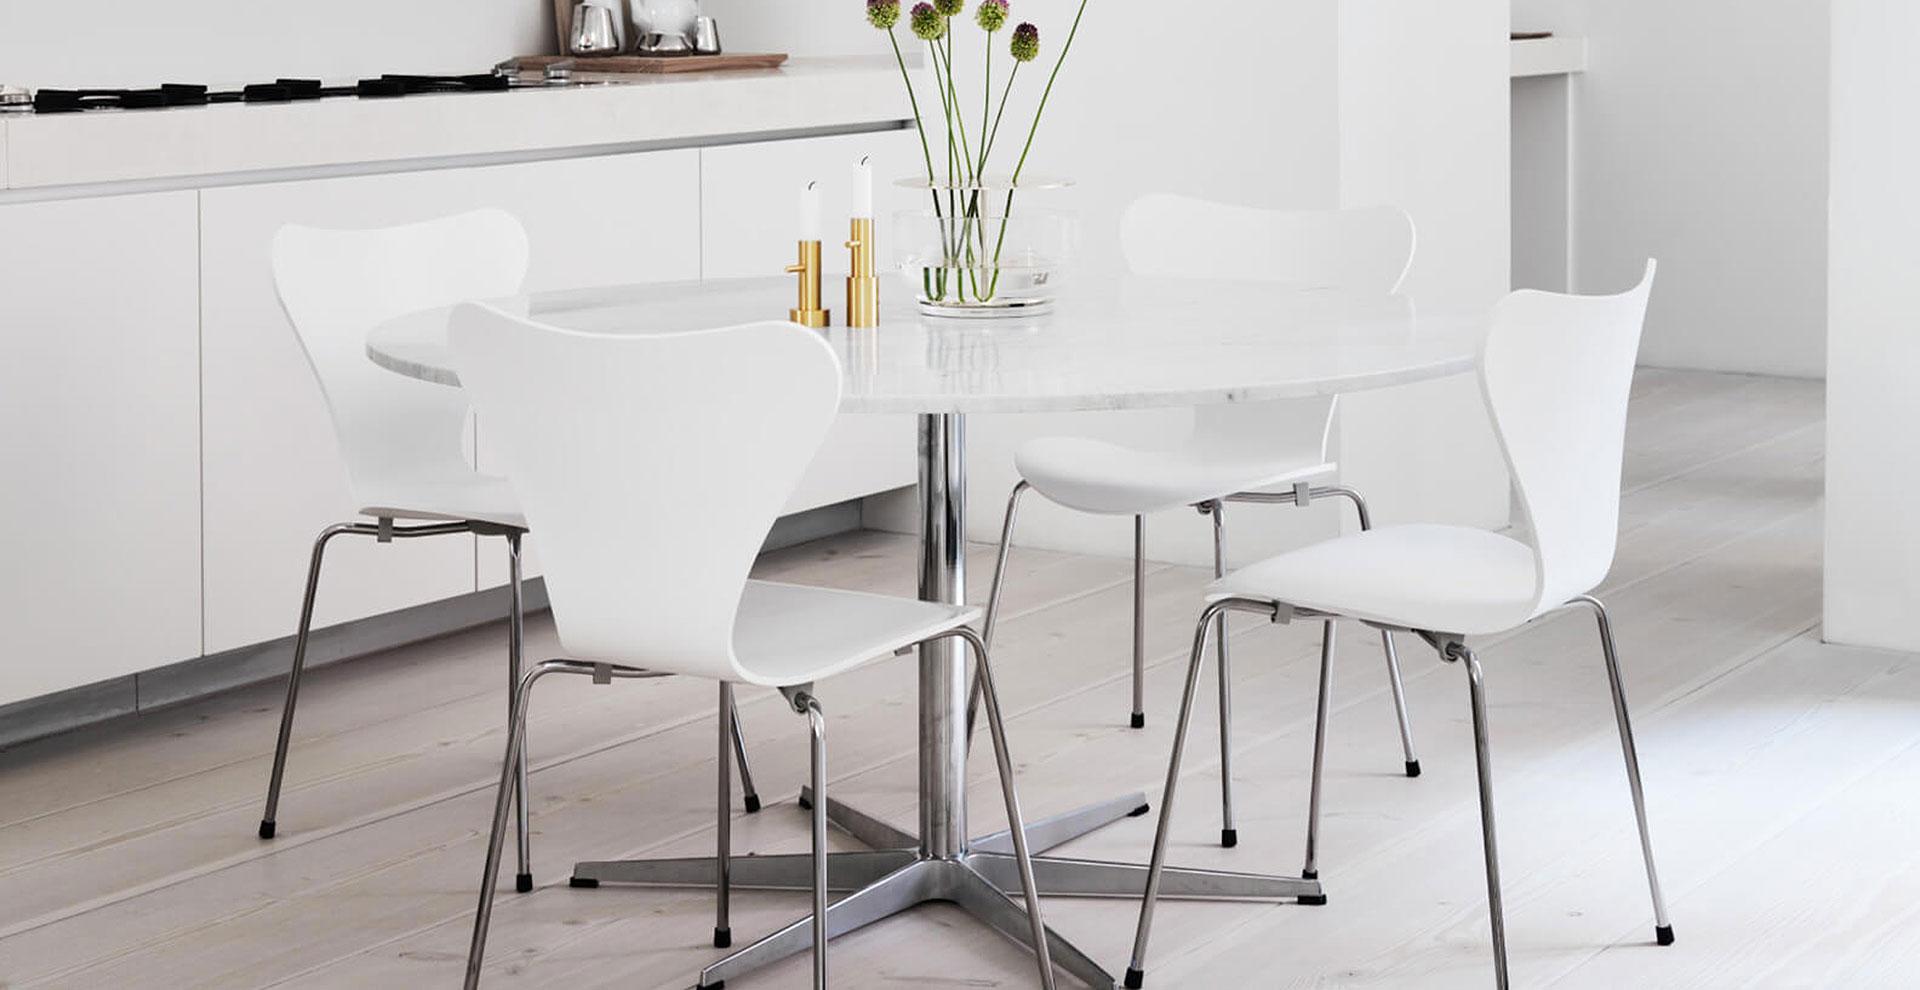 series 7 fritz hansen sedia series 7 fritz hansen. Black Bedroom Furniture Sets. Home Design Ideas